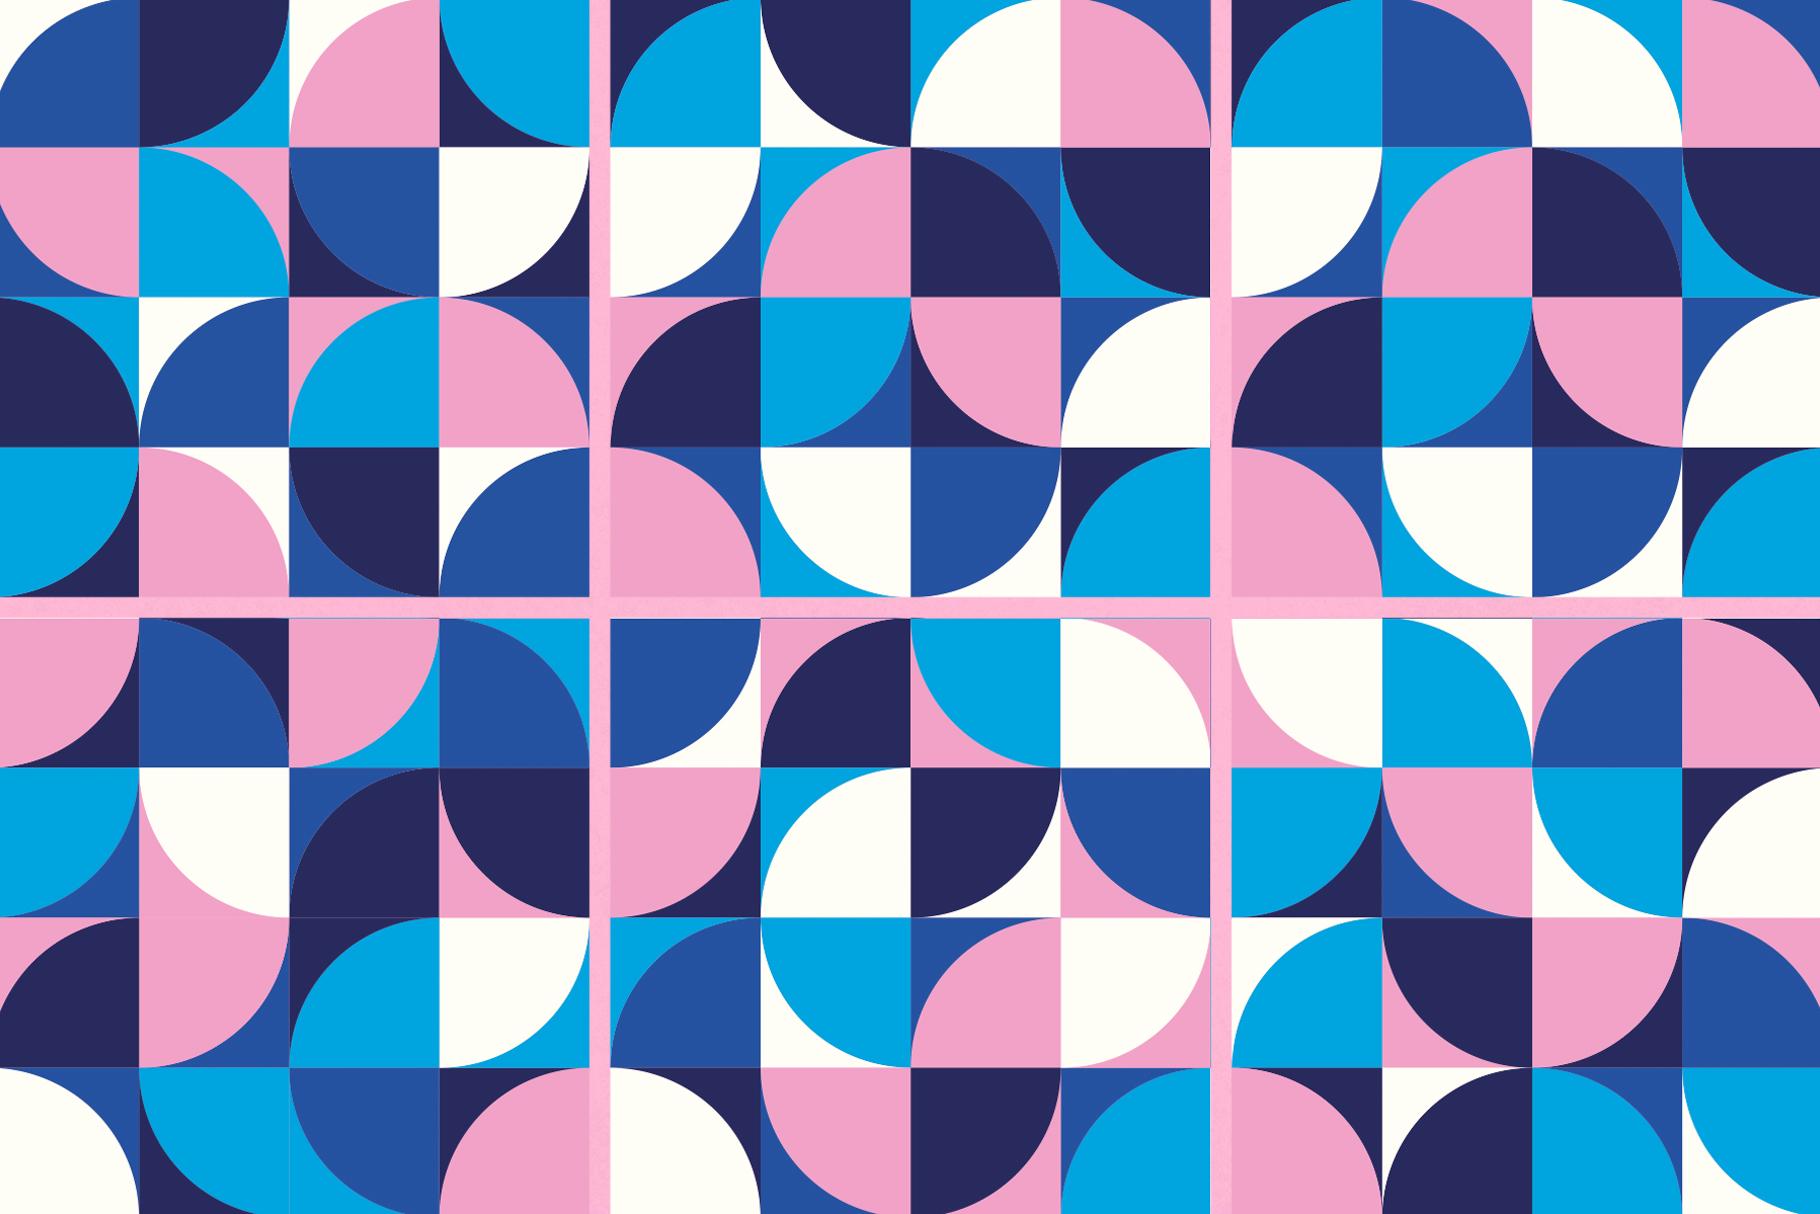 Geometric Shapes Patterns example image 6